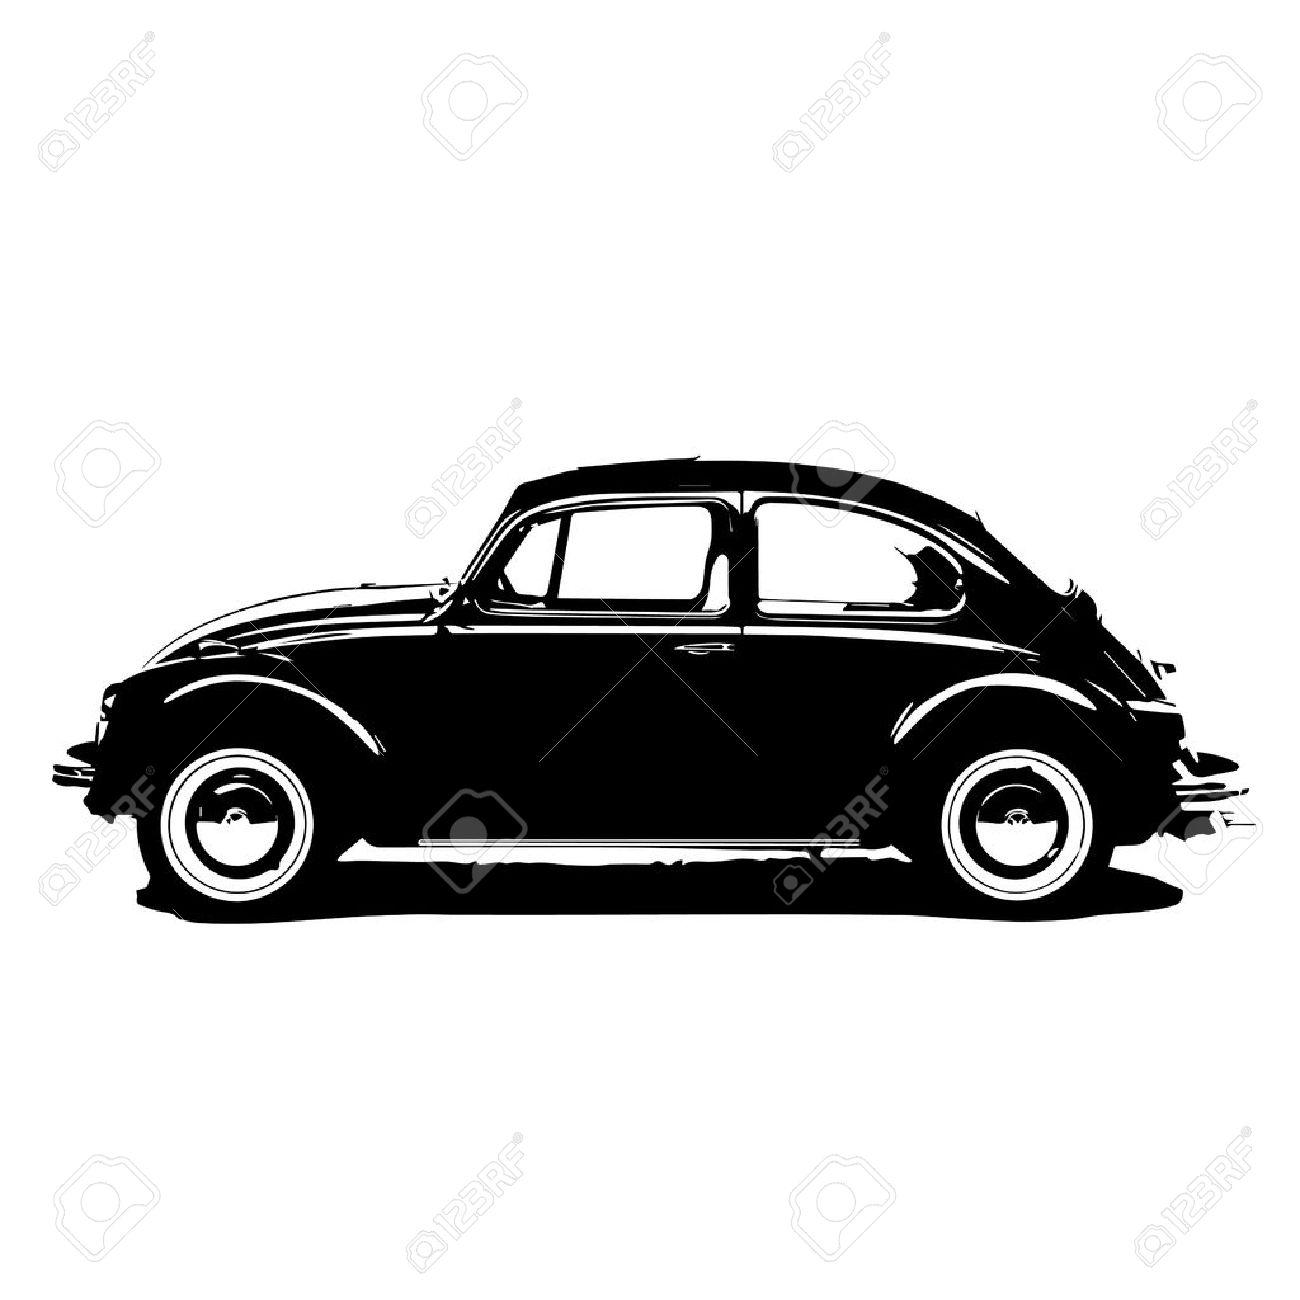 beetle car vector - 64385632